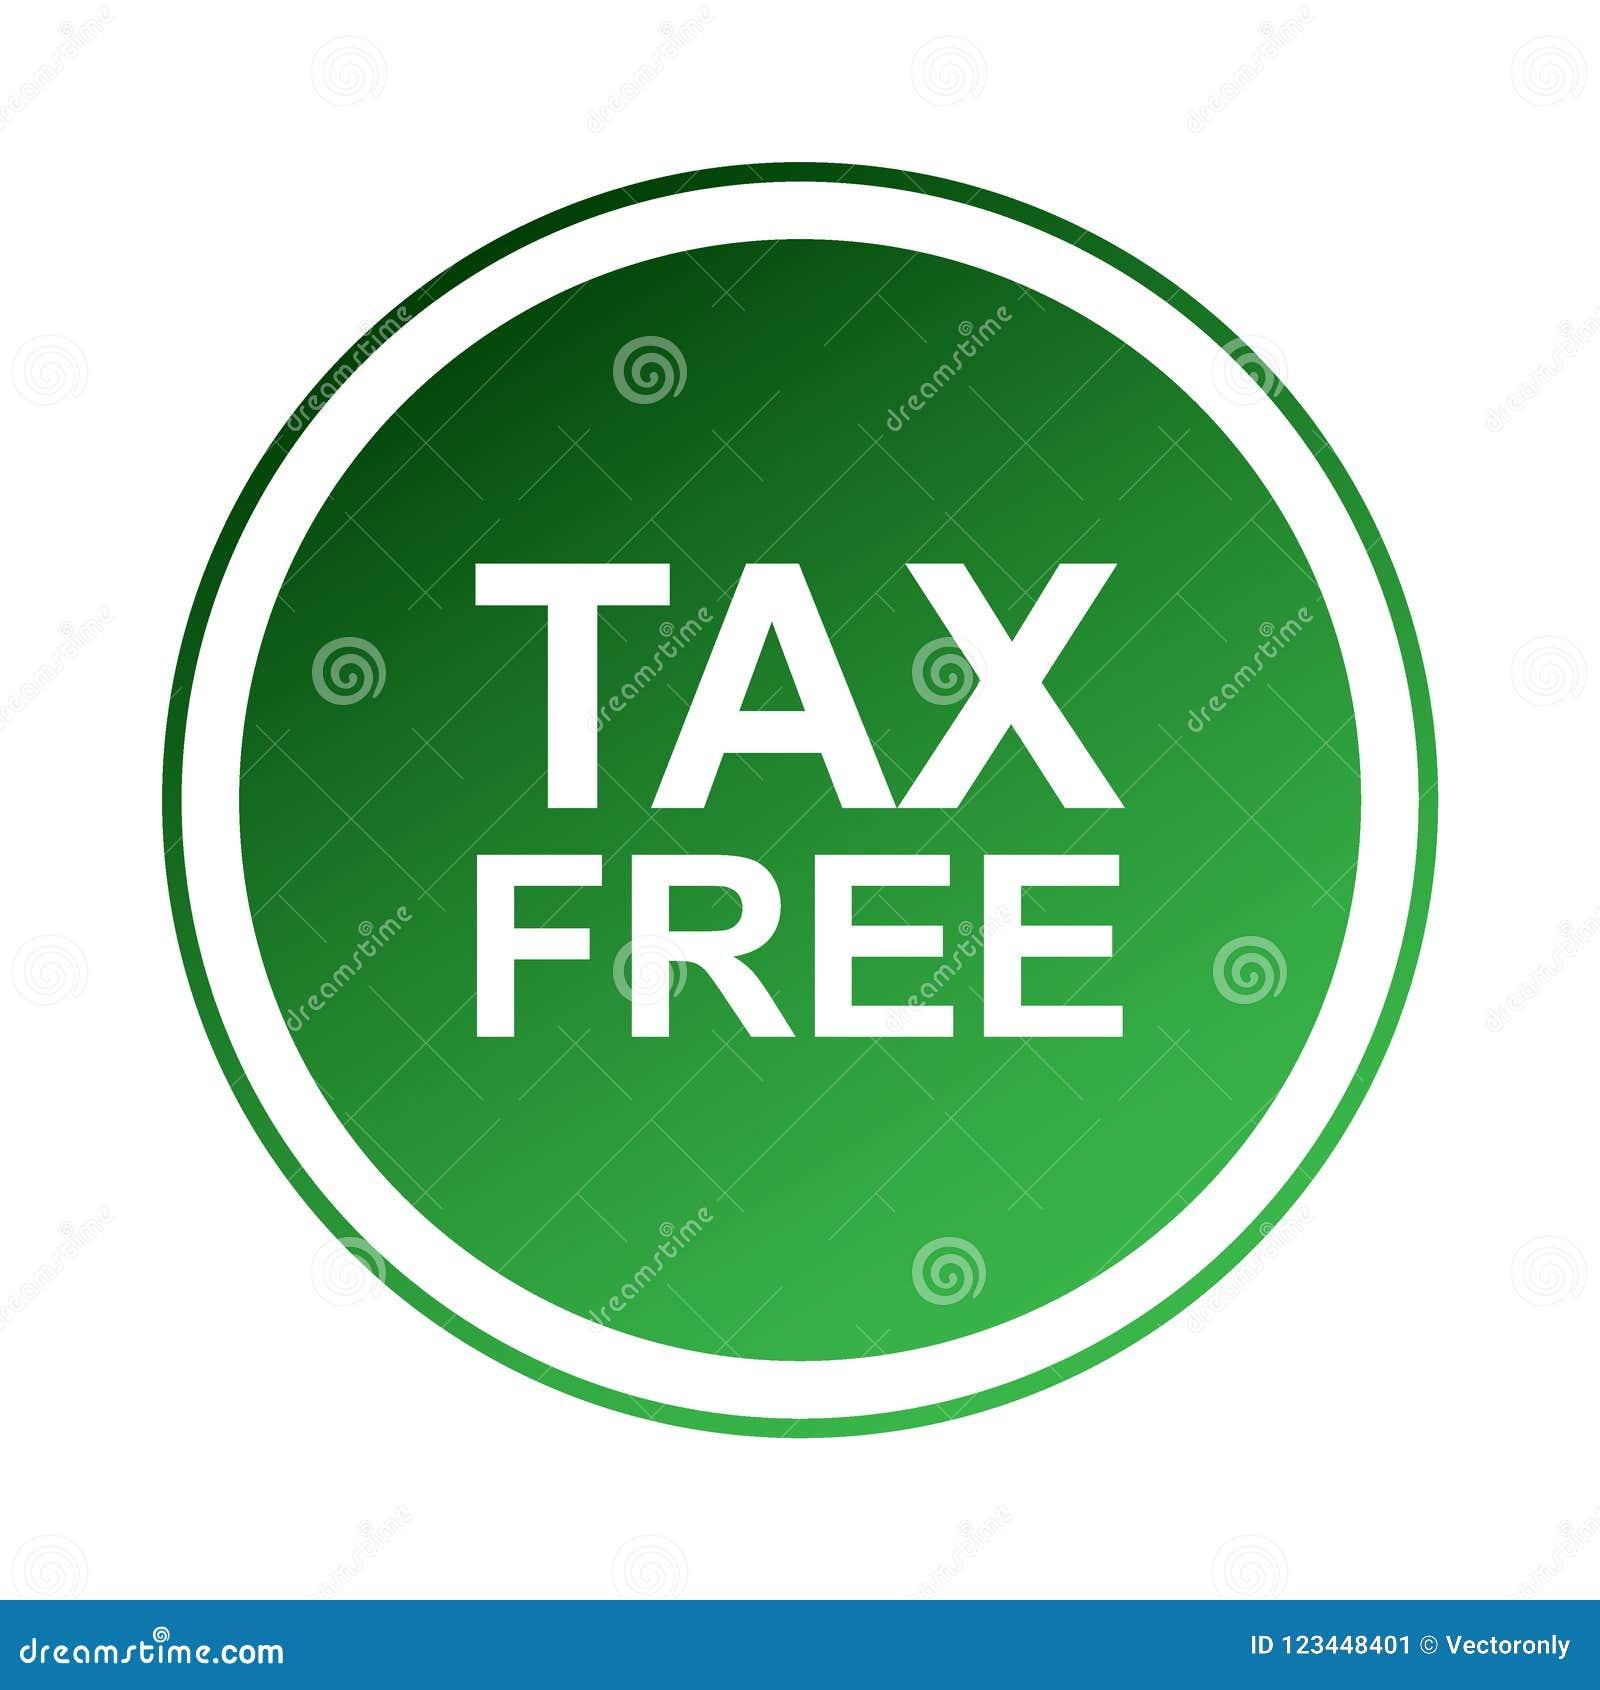 Tax free label stock illustration  Illustration of gift